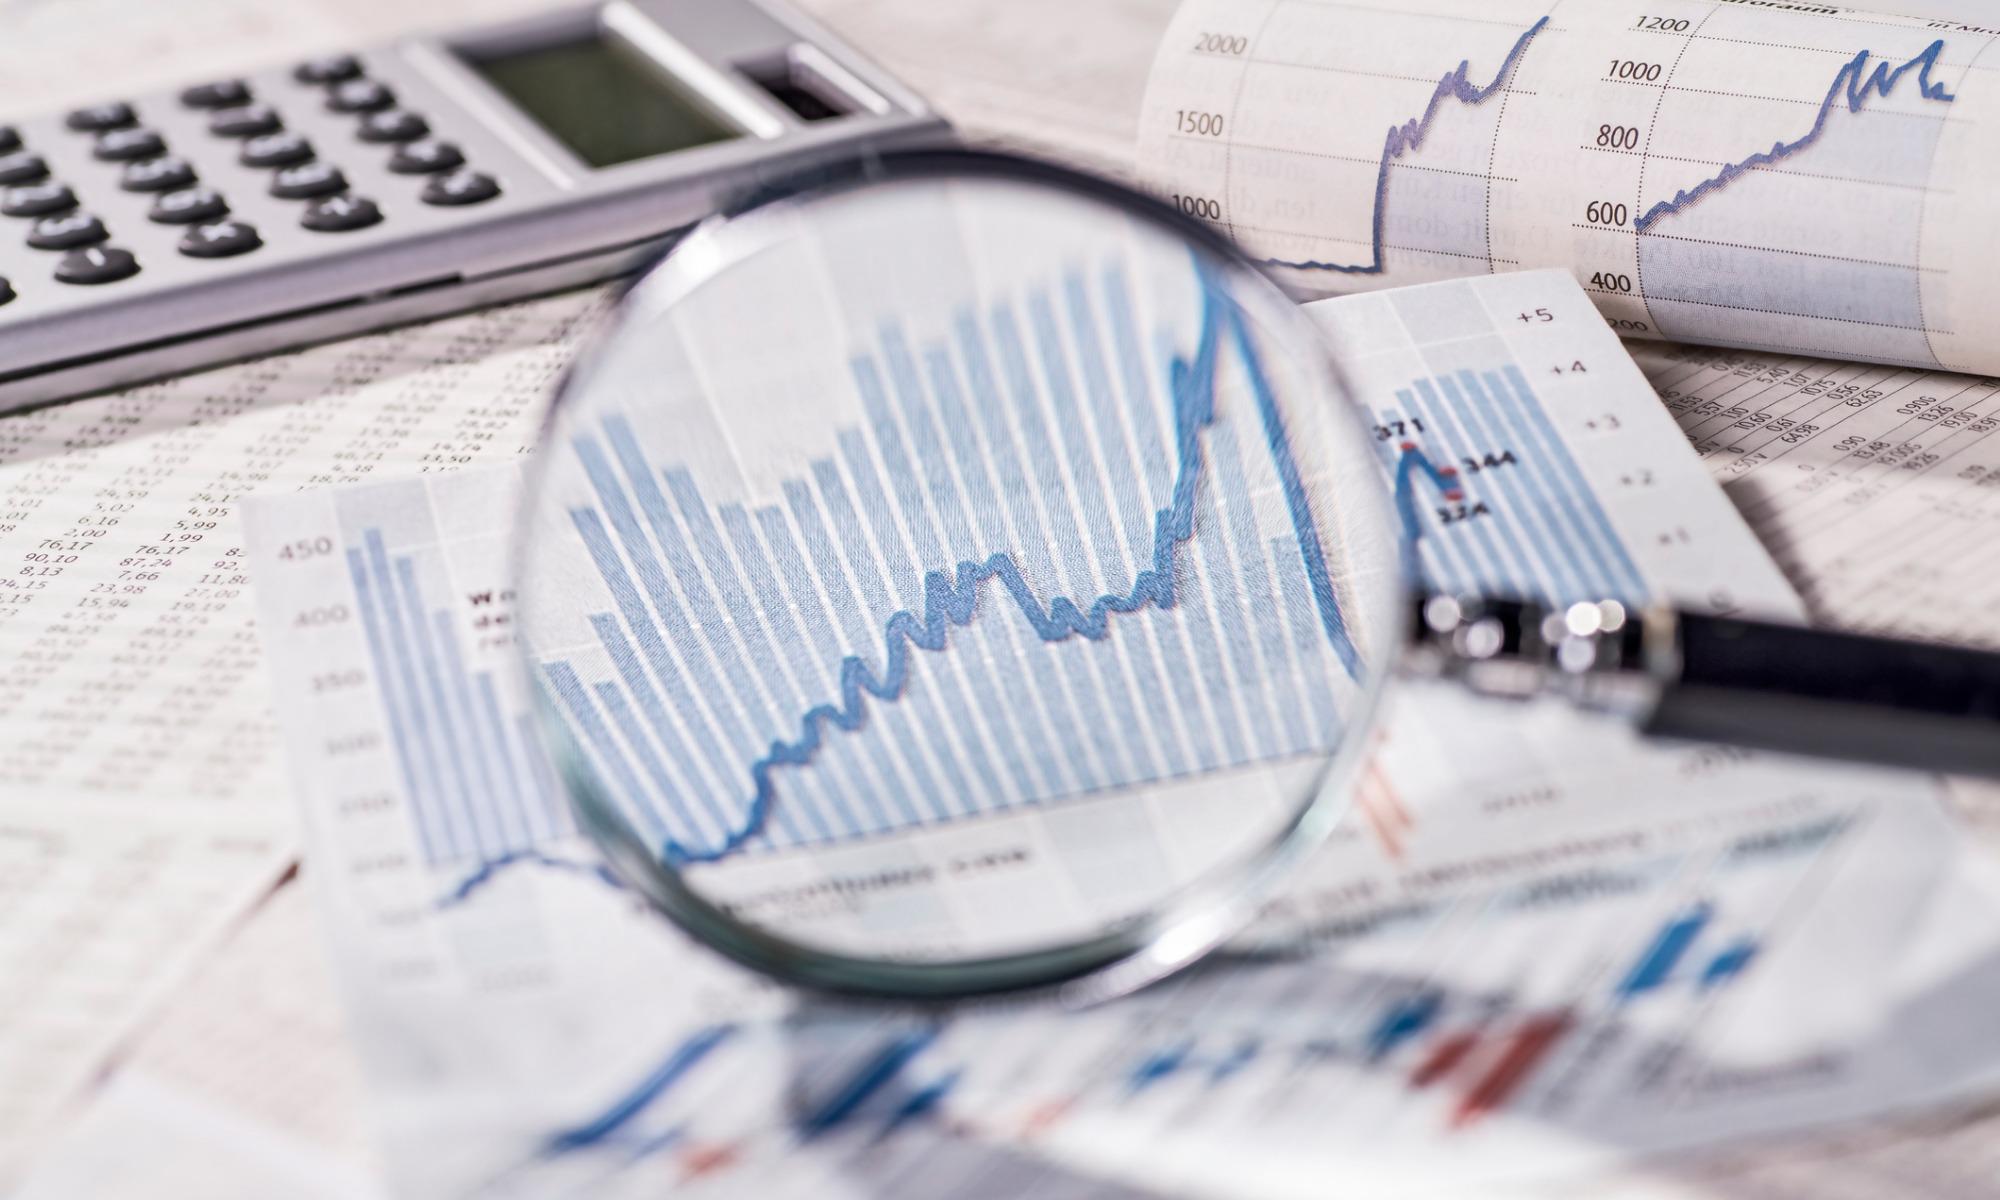 Multifamily Real Estate Can Reduce The Volatility Of Your Portfolio Nesteggrx